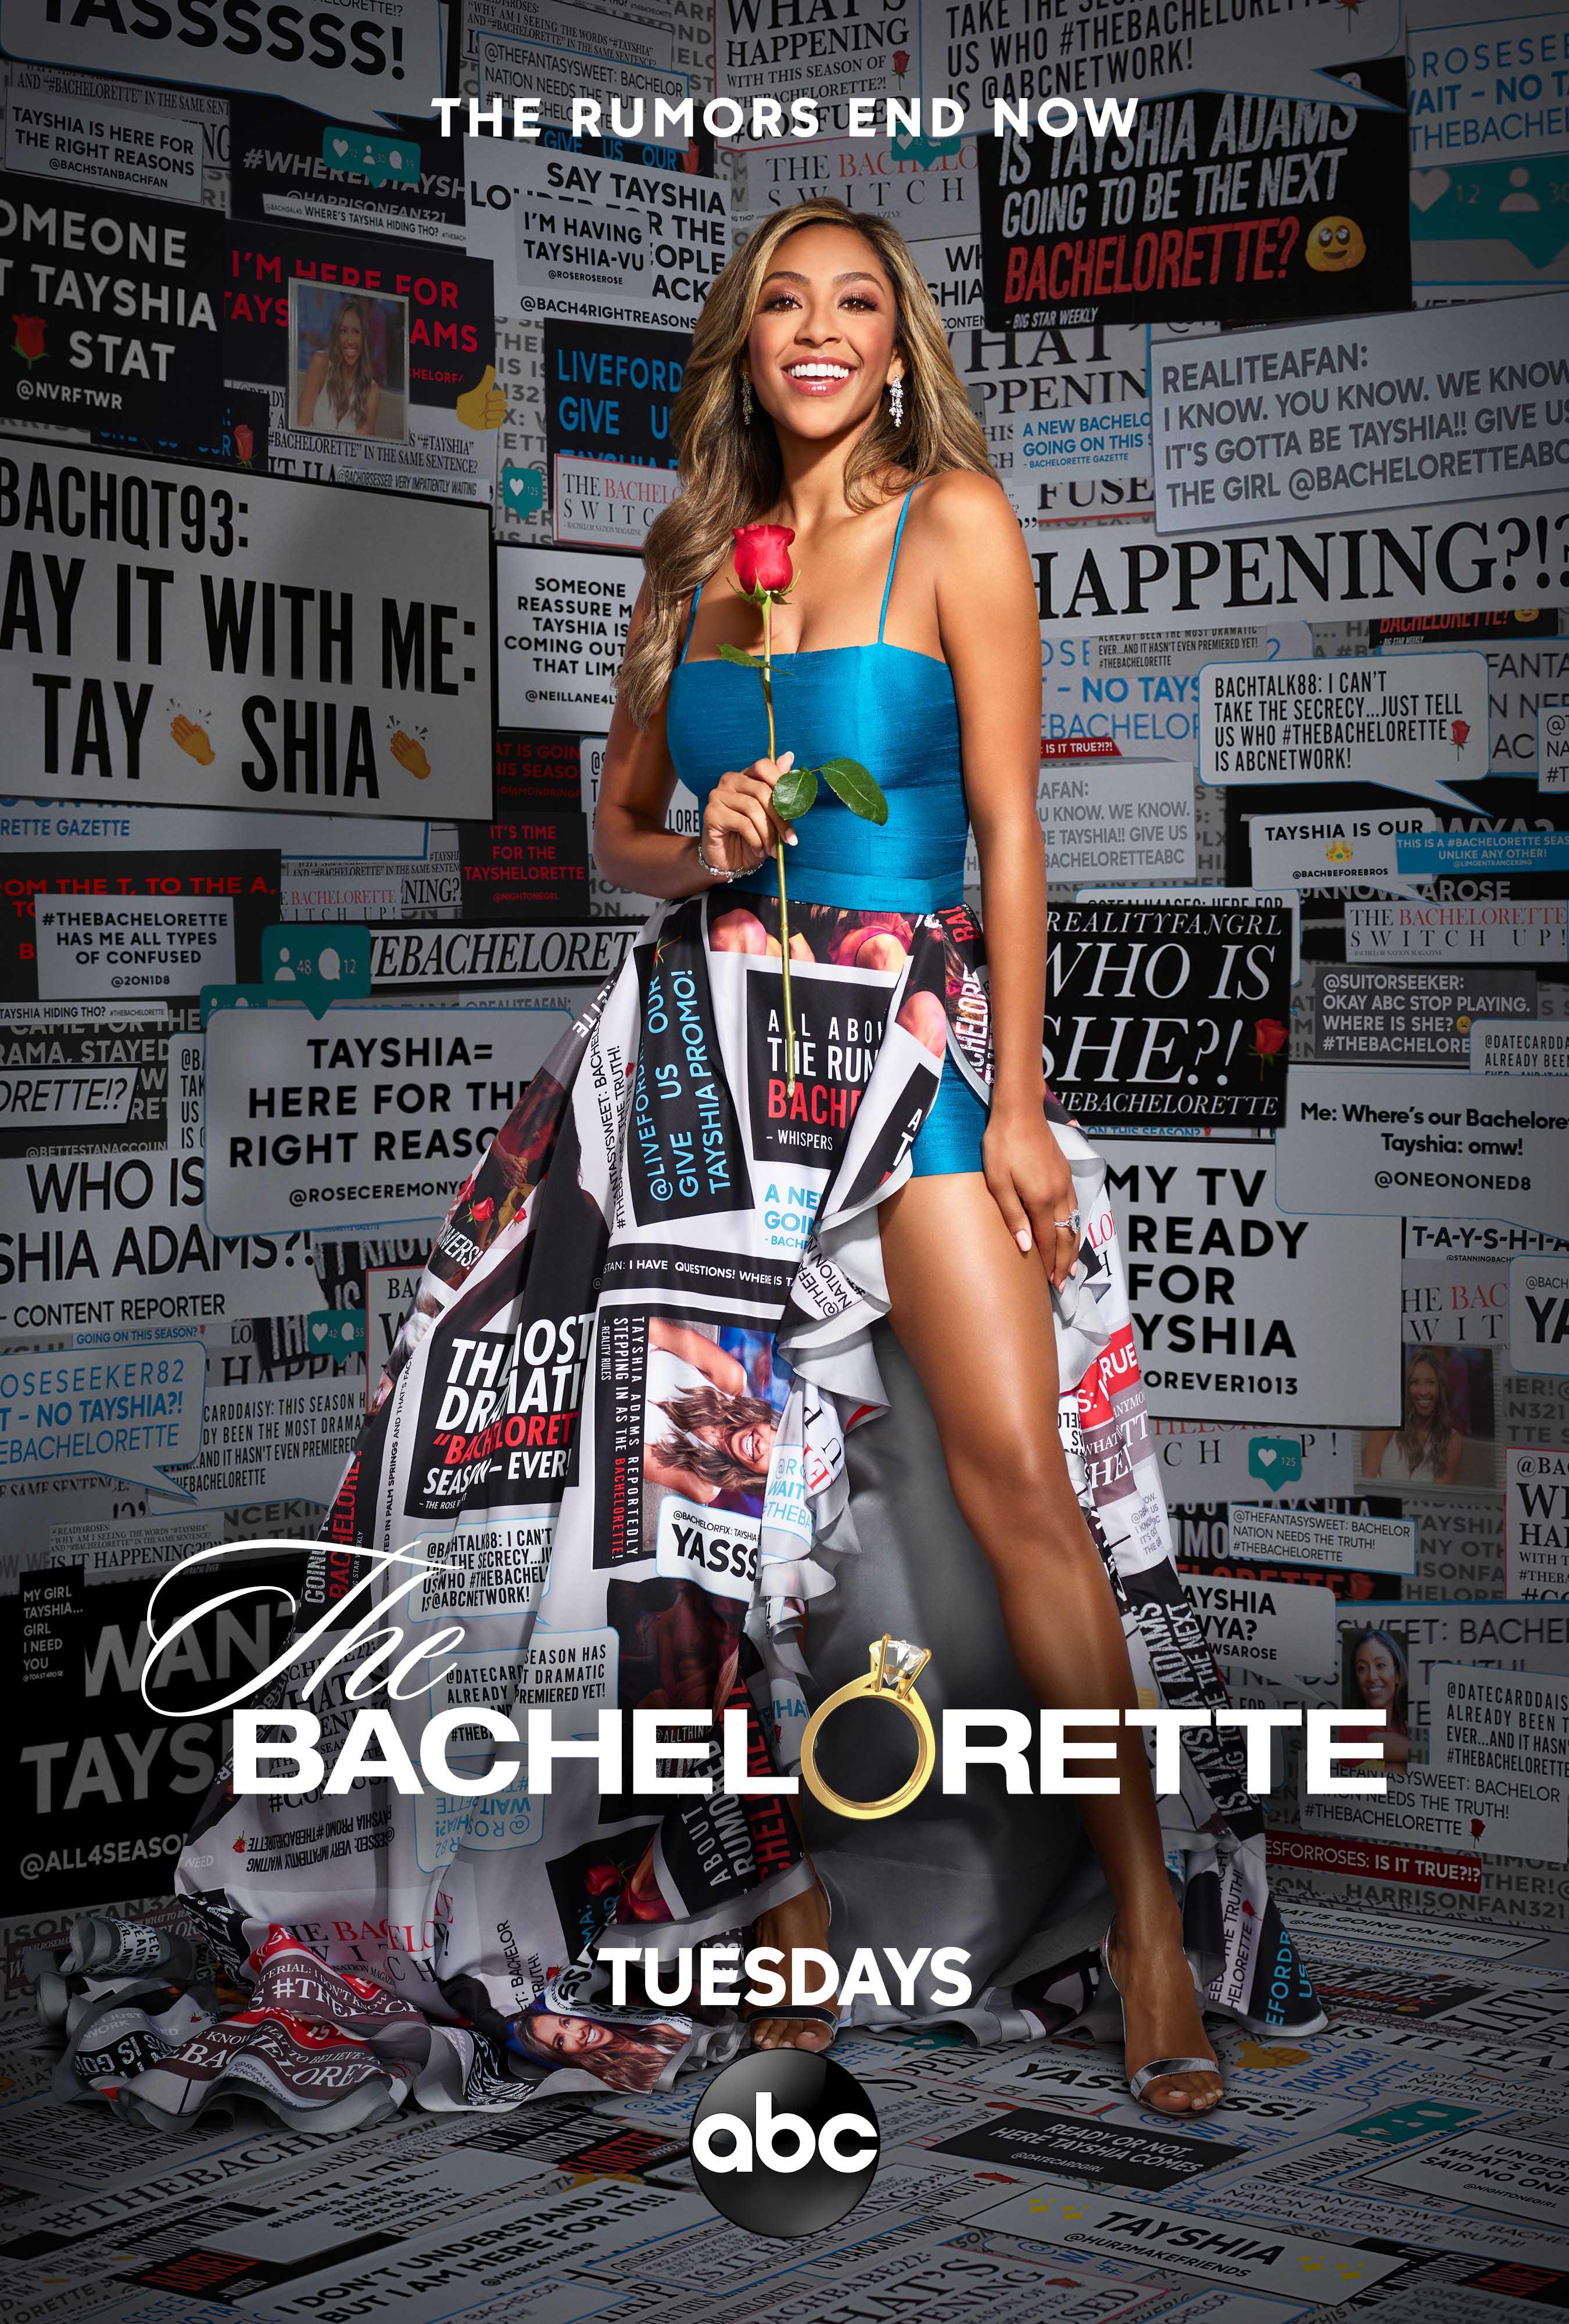 Bachelor Recap for 12/2